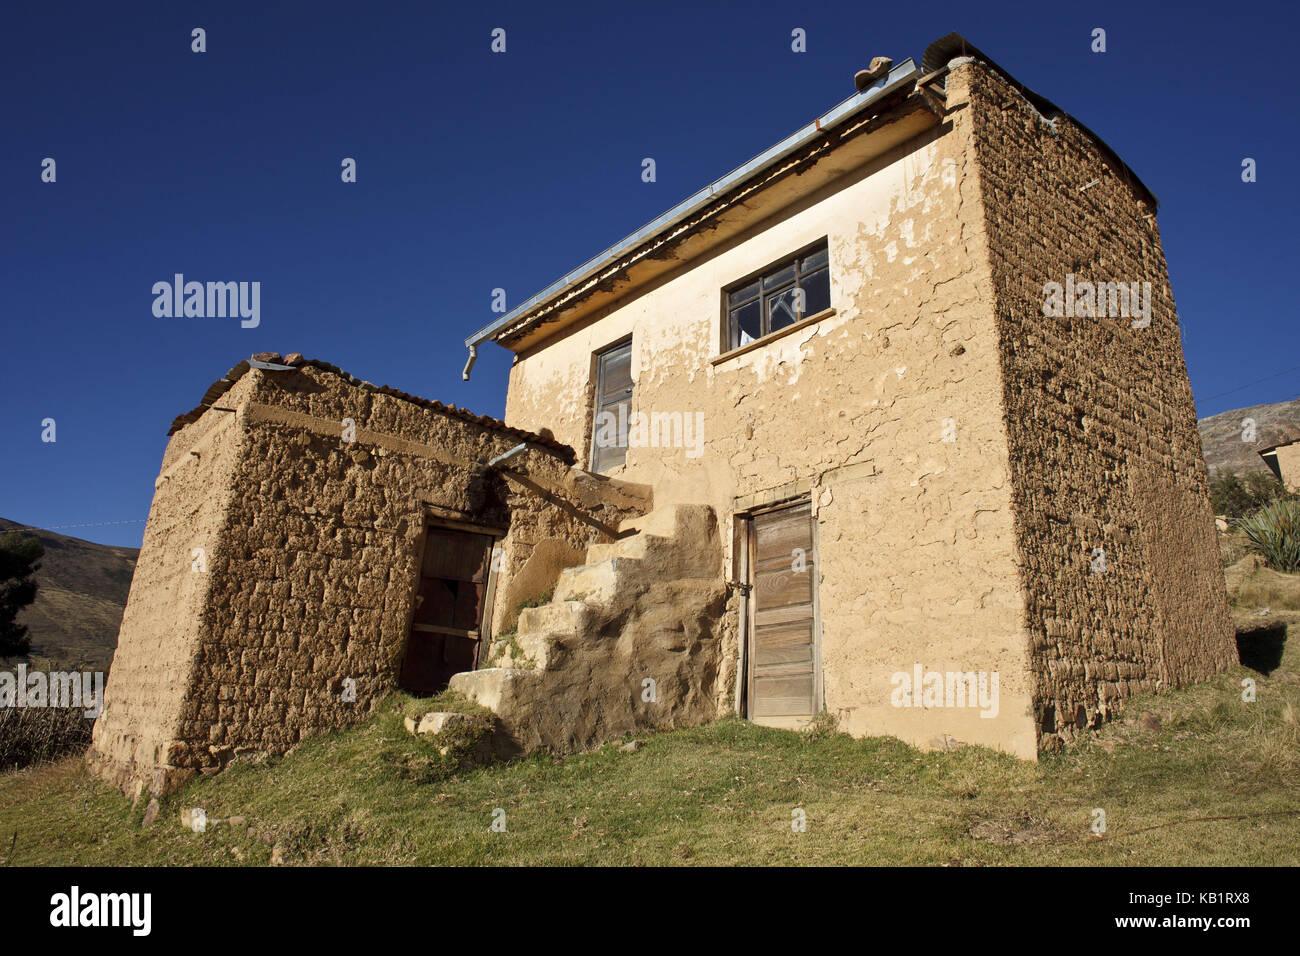 Bolivia, Titicacasee, Copacabana, Adobehaus, - Stock Image